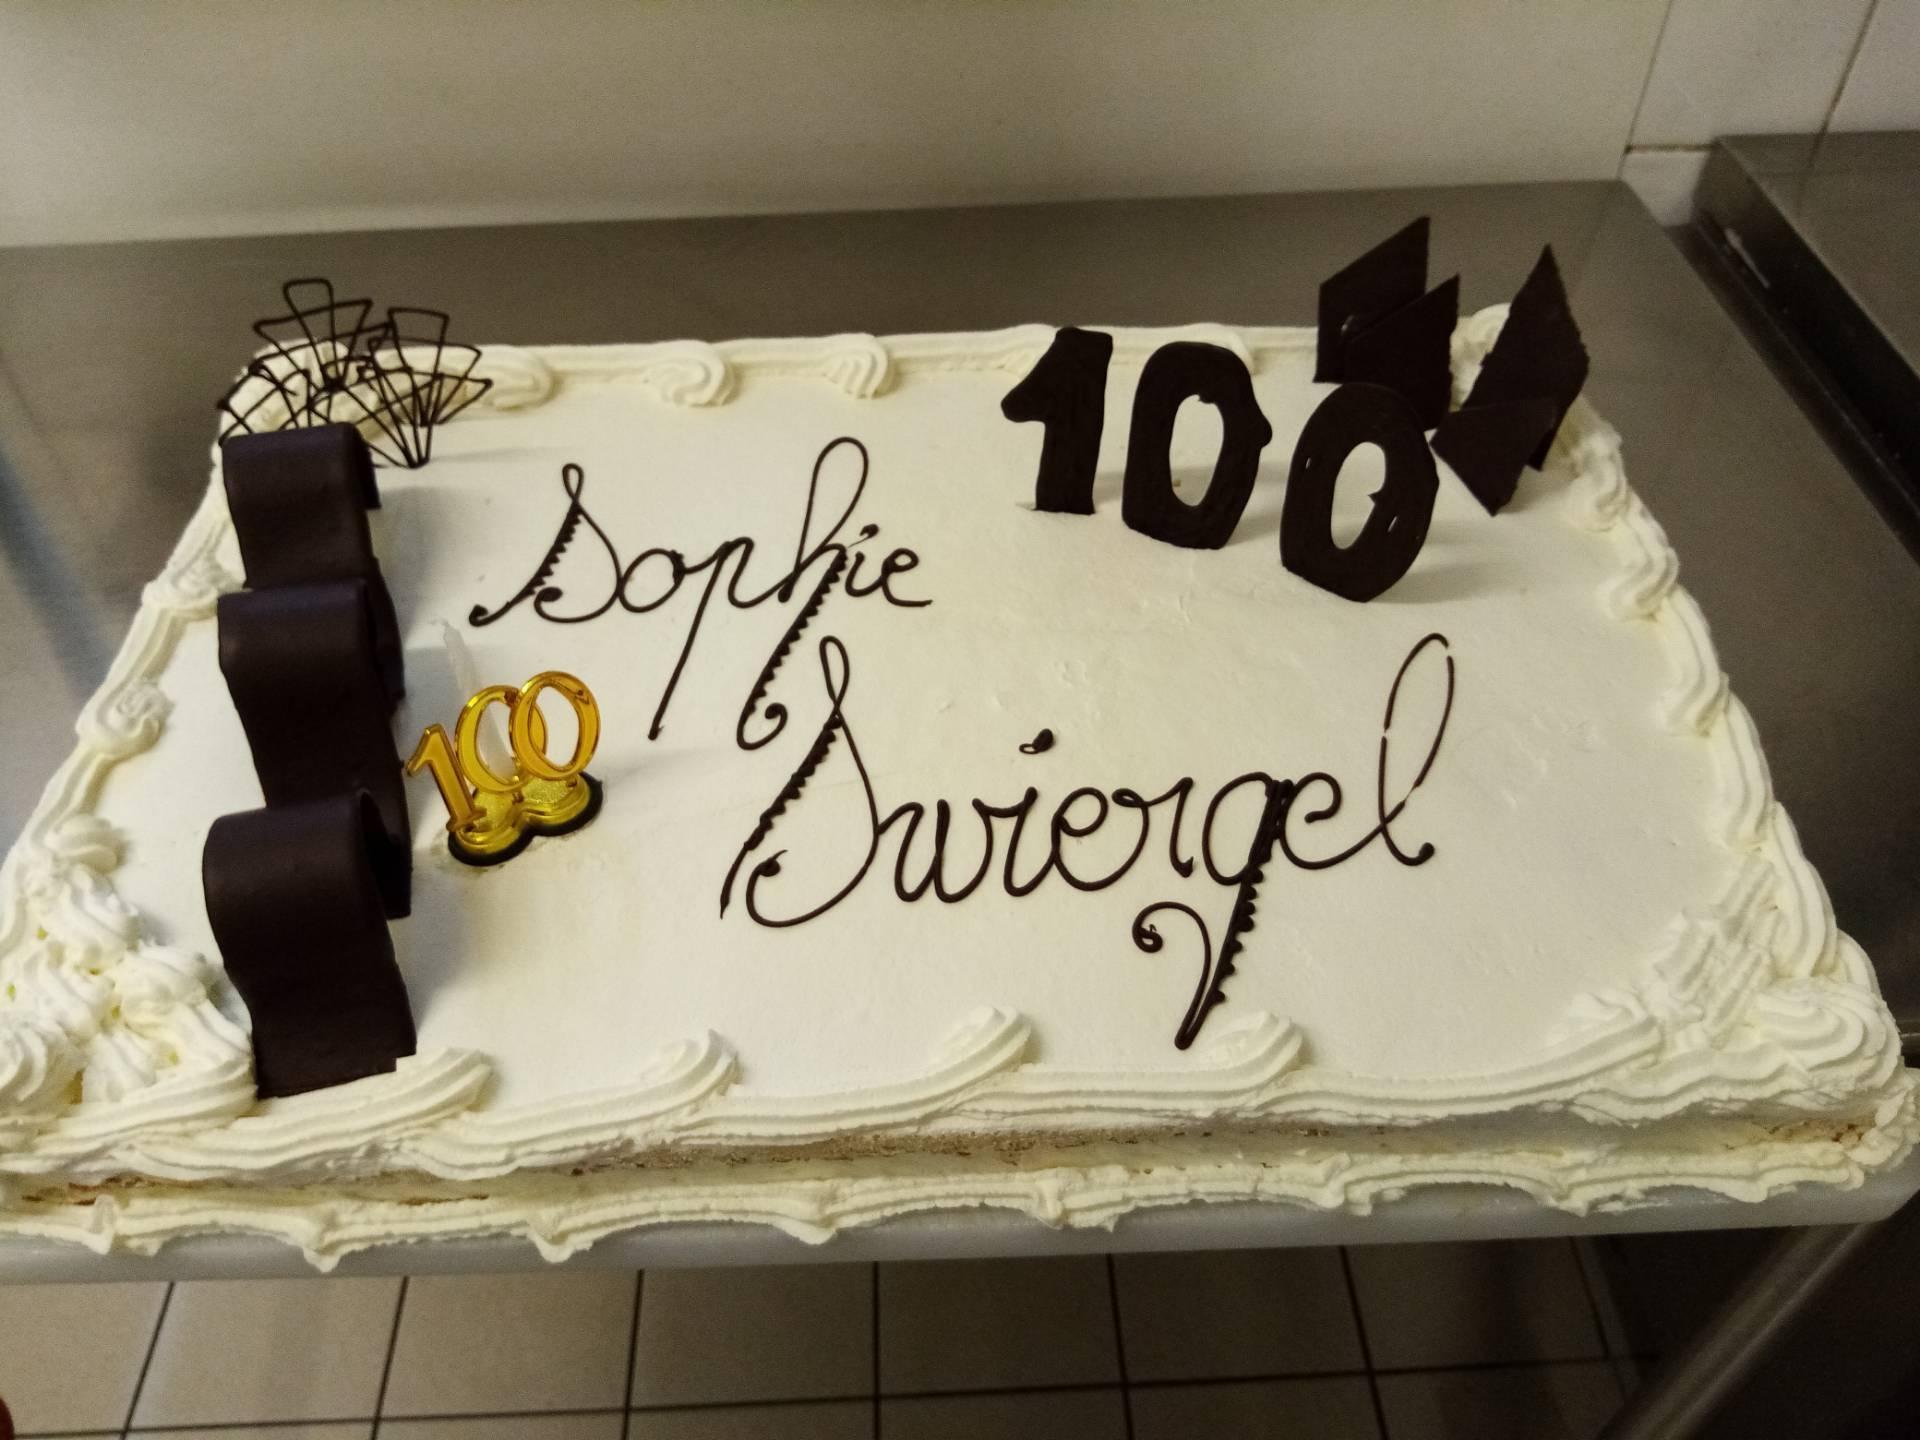 100 ans gâteau